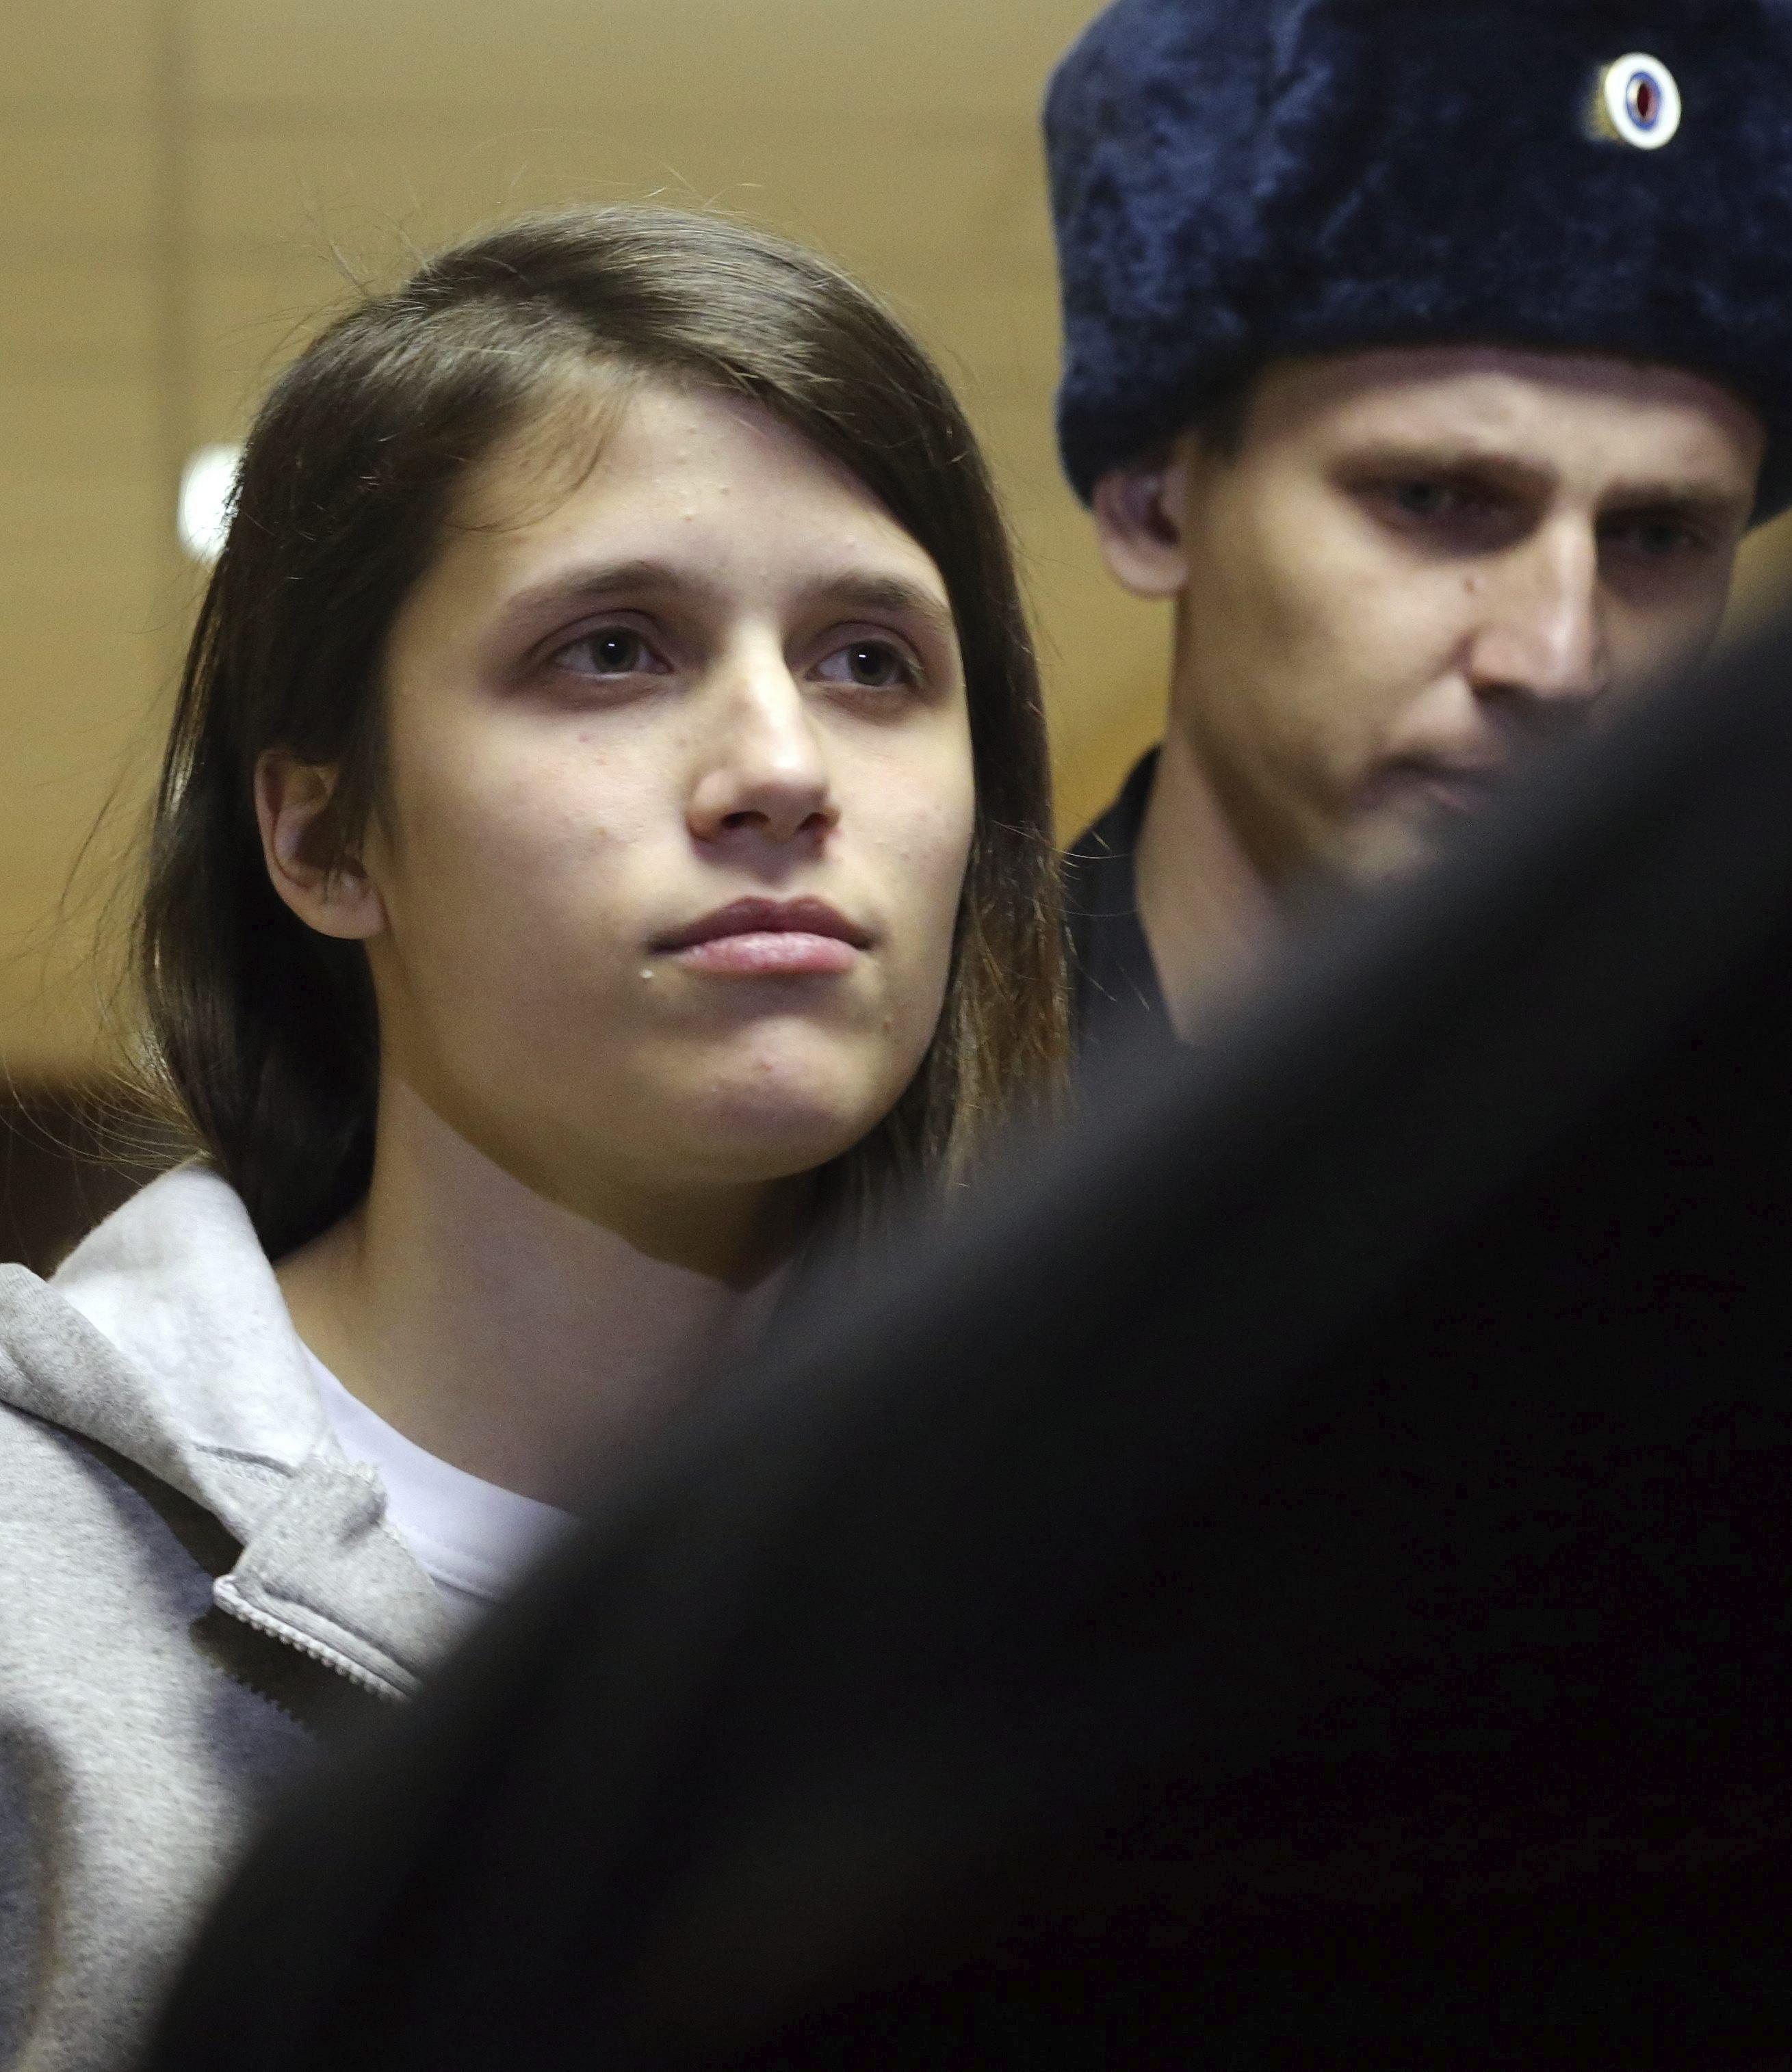 Termina la desventura rusa de los tripulantes del rompehielos de Greenpeace